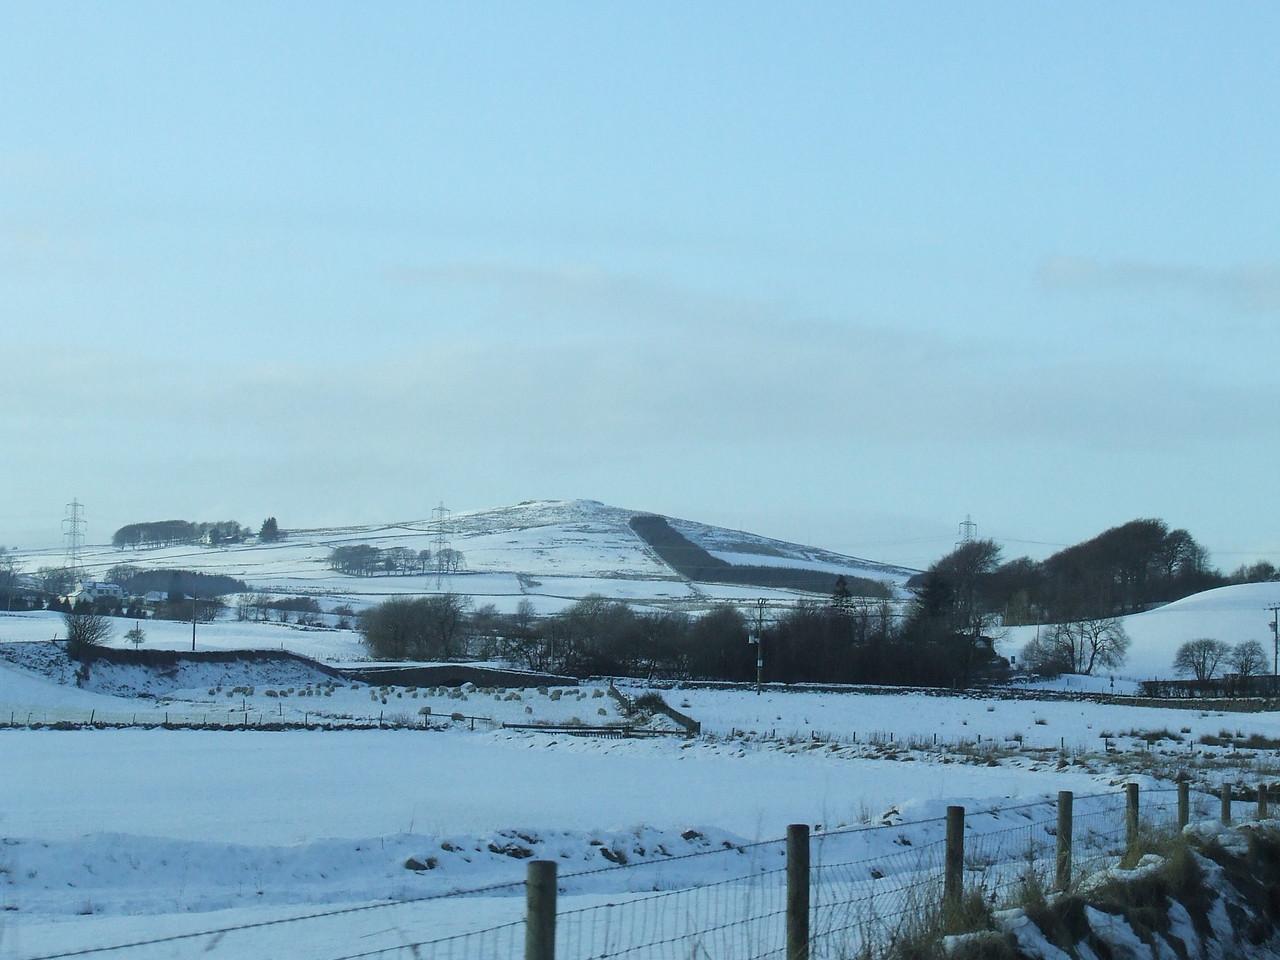 Between Chapel Farm and Burnbank Farm on the B788 between Kilmacolm and Greenock